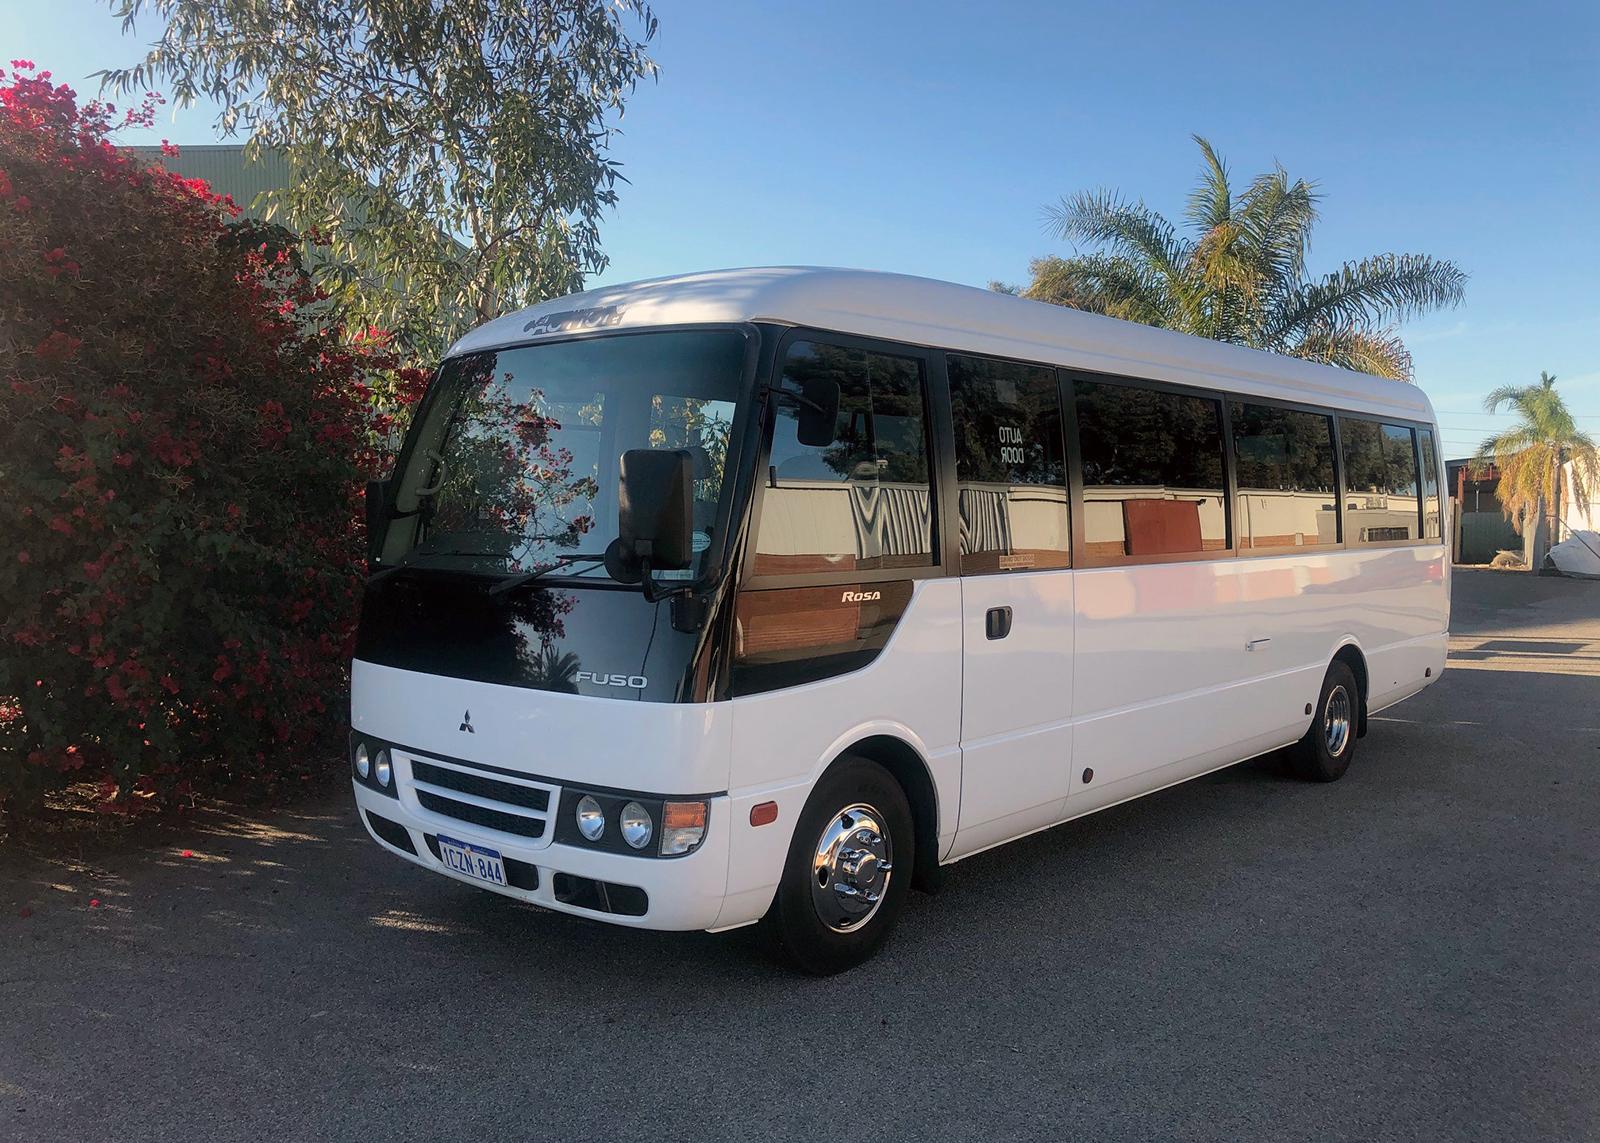 Rosa bus new1600x1143